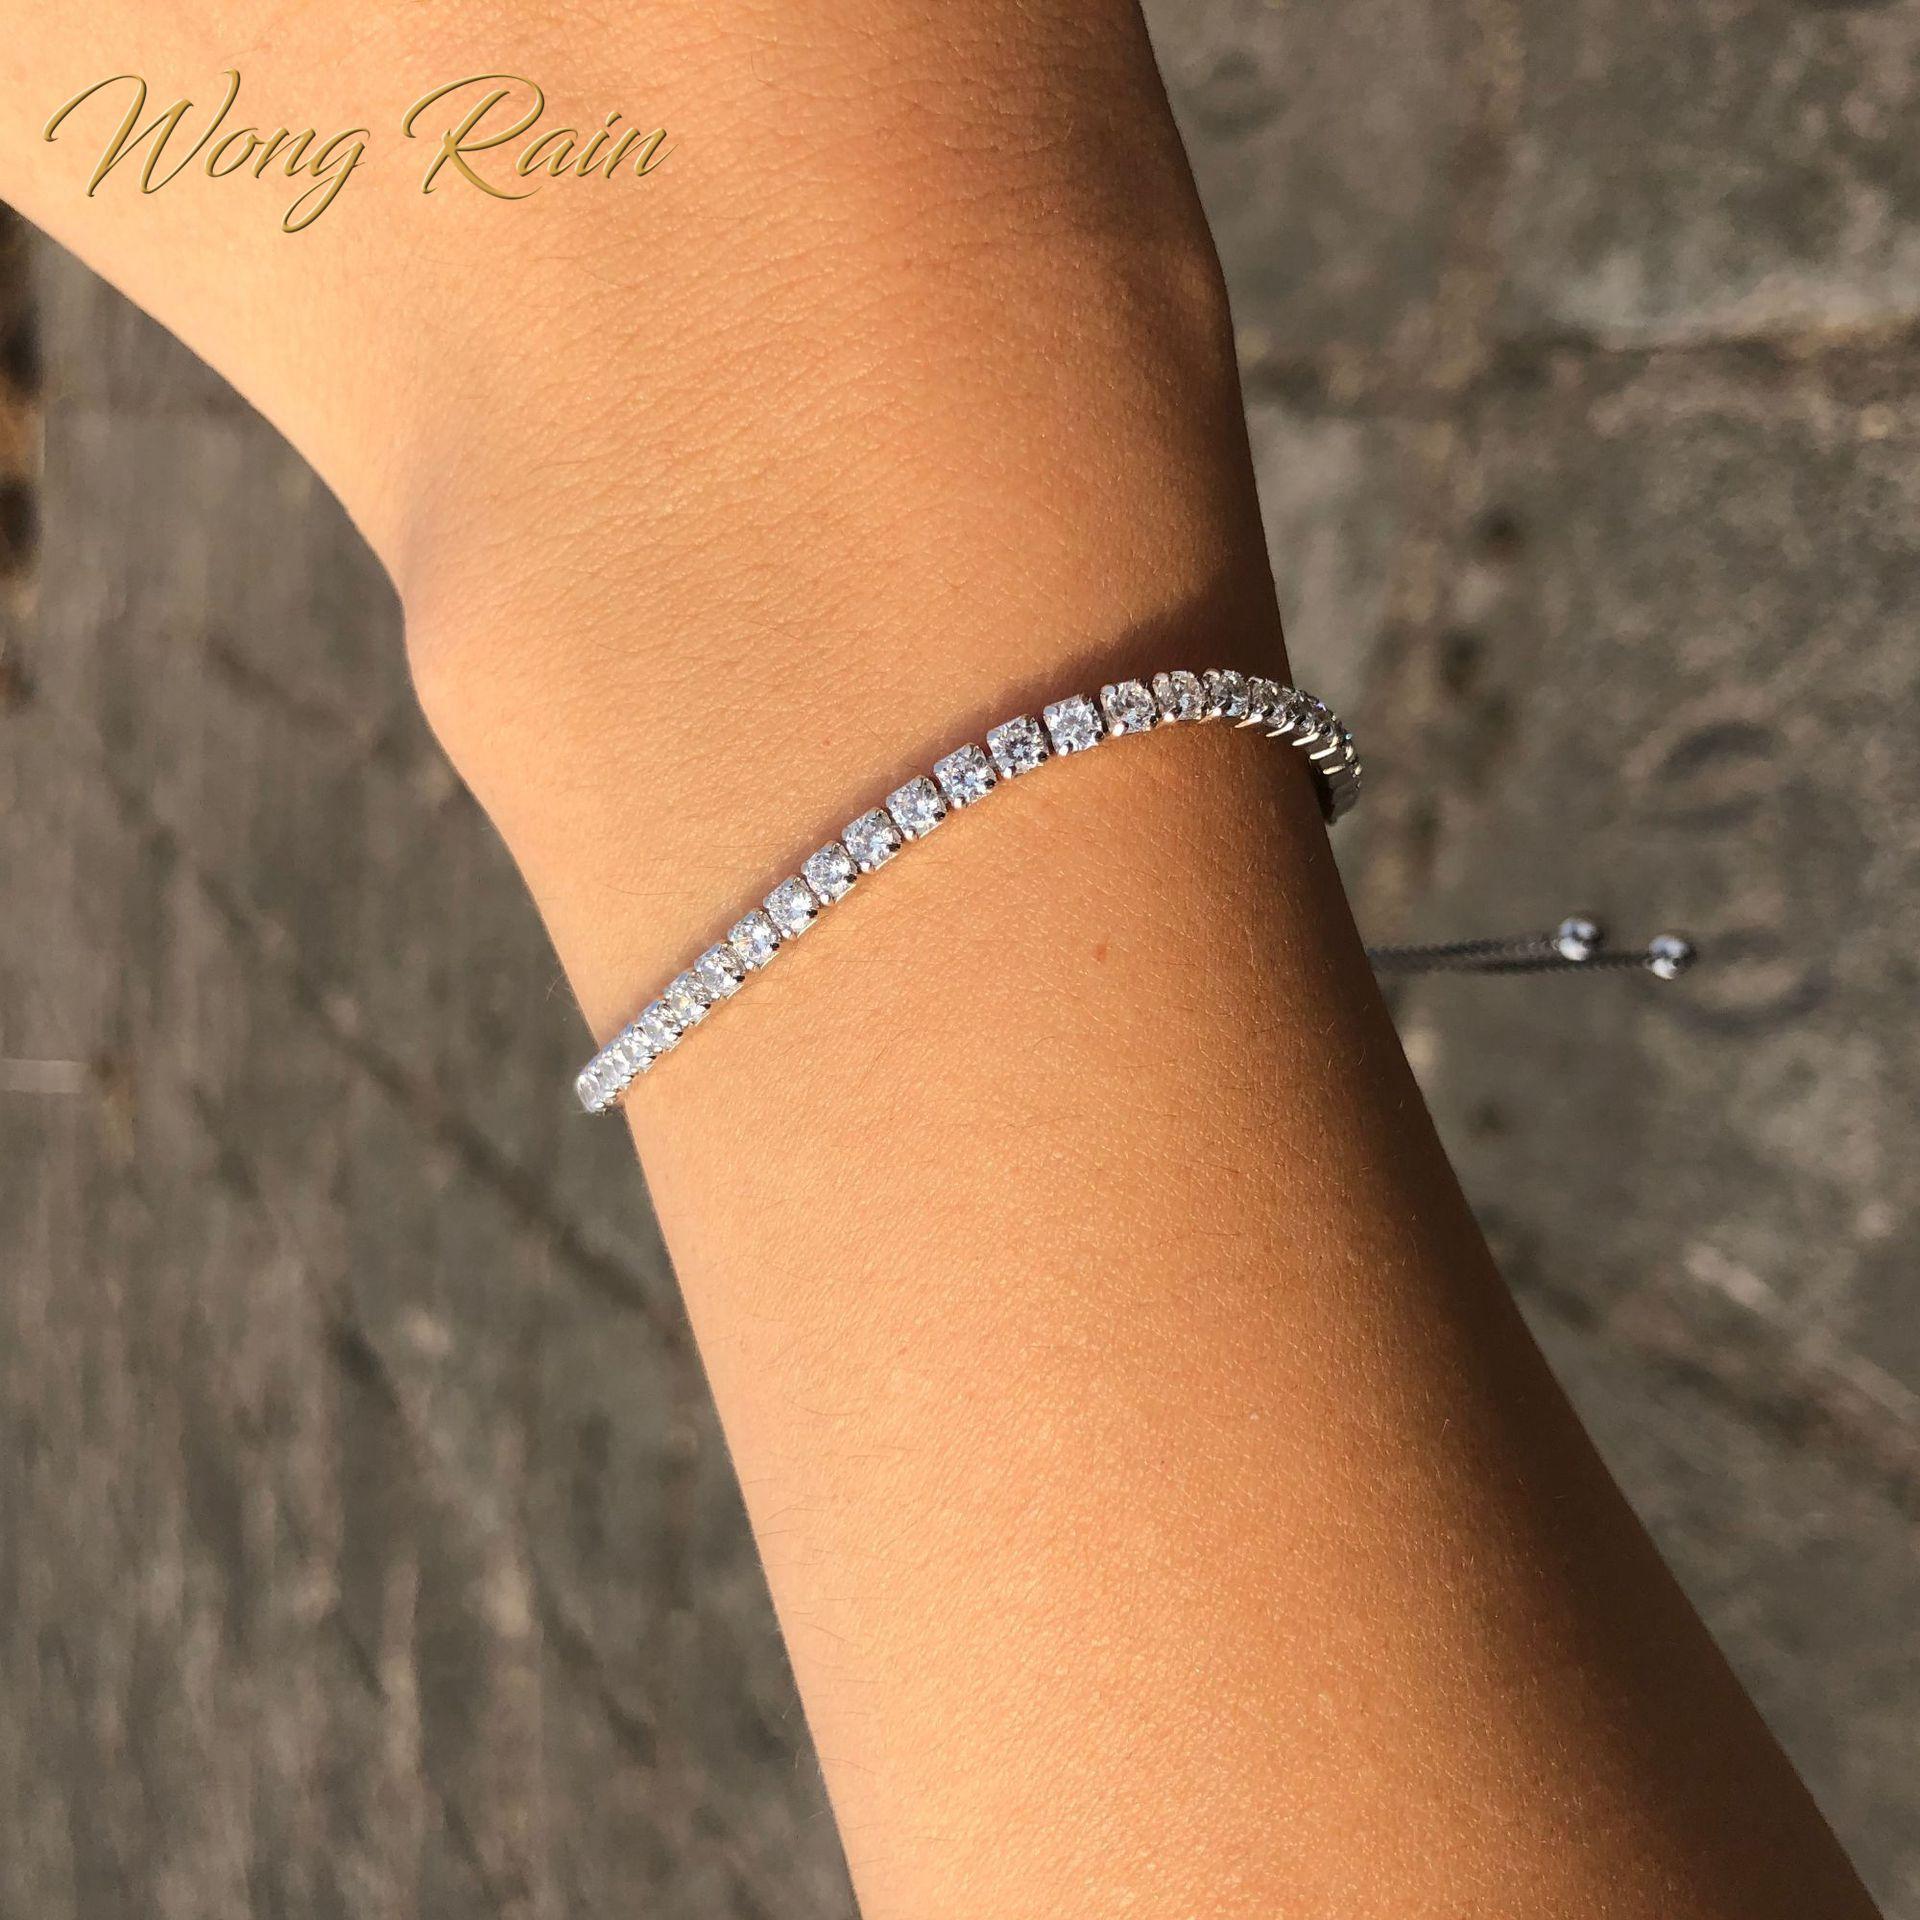 Wong Rain 100% 925 Sterling Silver Created Moissanite Gemstone Bangle Charm Wedding Engagement Bracelet Fine Jewelry Wholesale